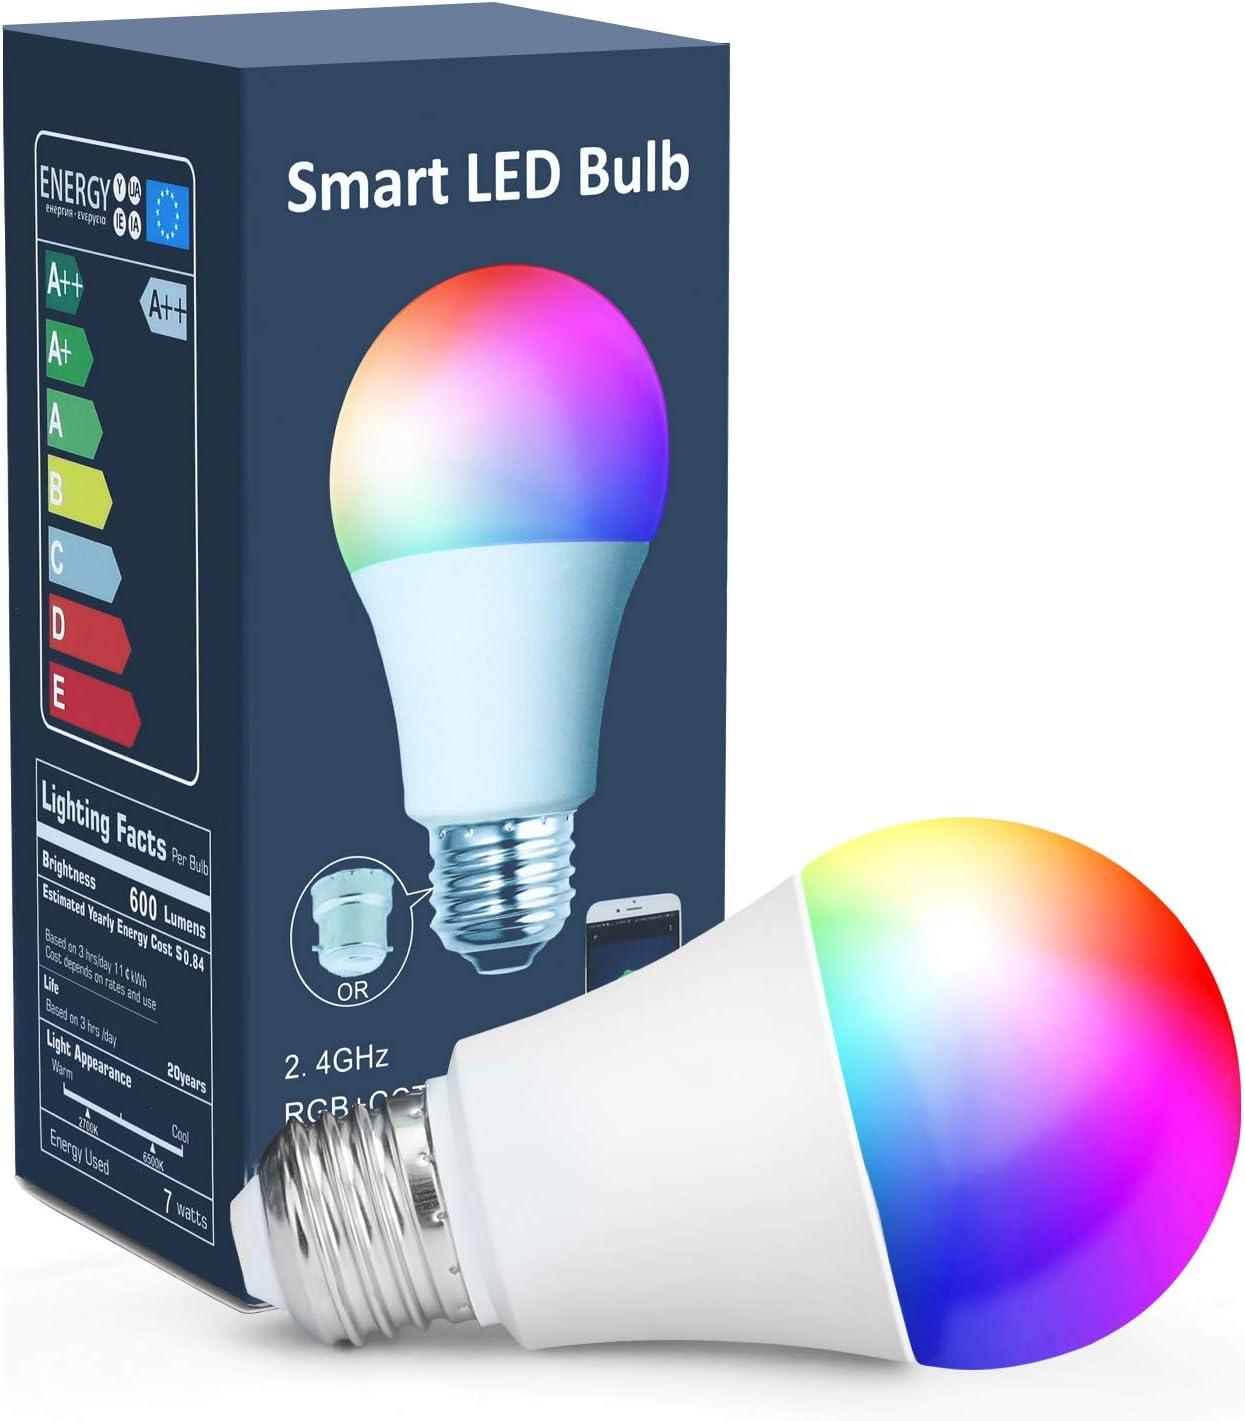 Smart WiFi Bulb Light Multicolor LED Light Compatible For Alexa Google Assistant